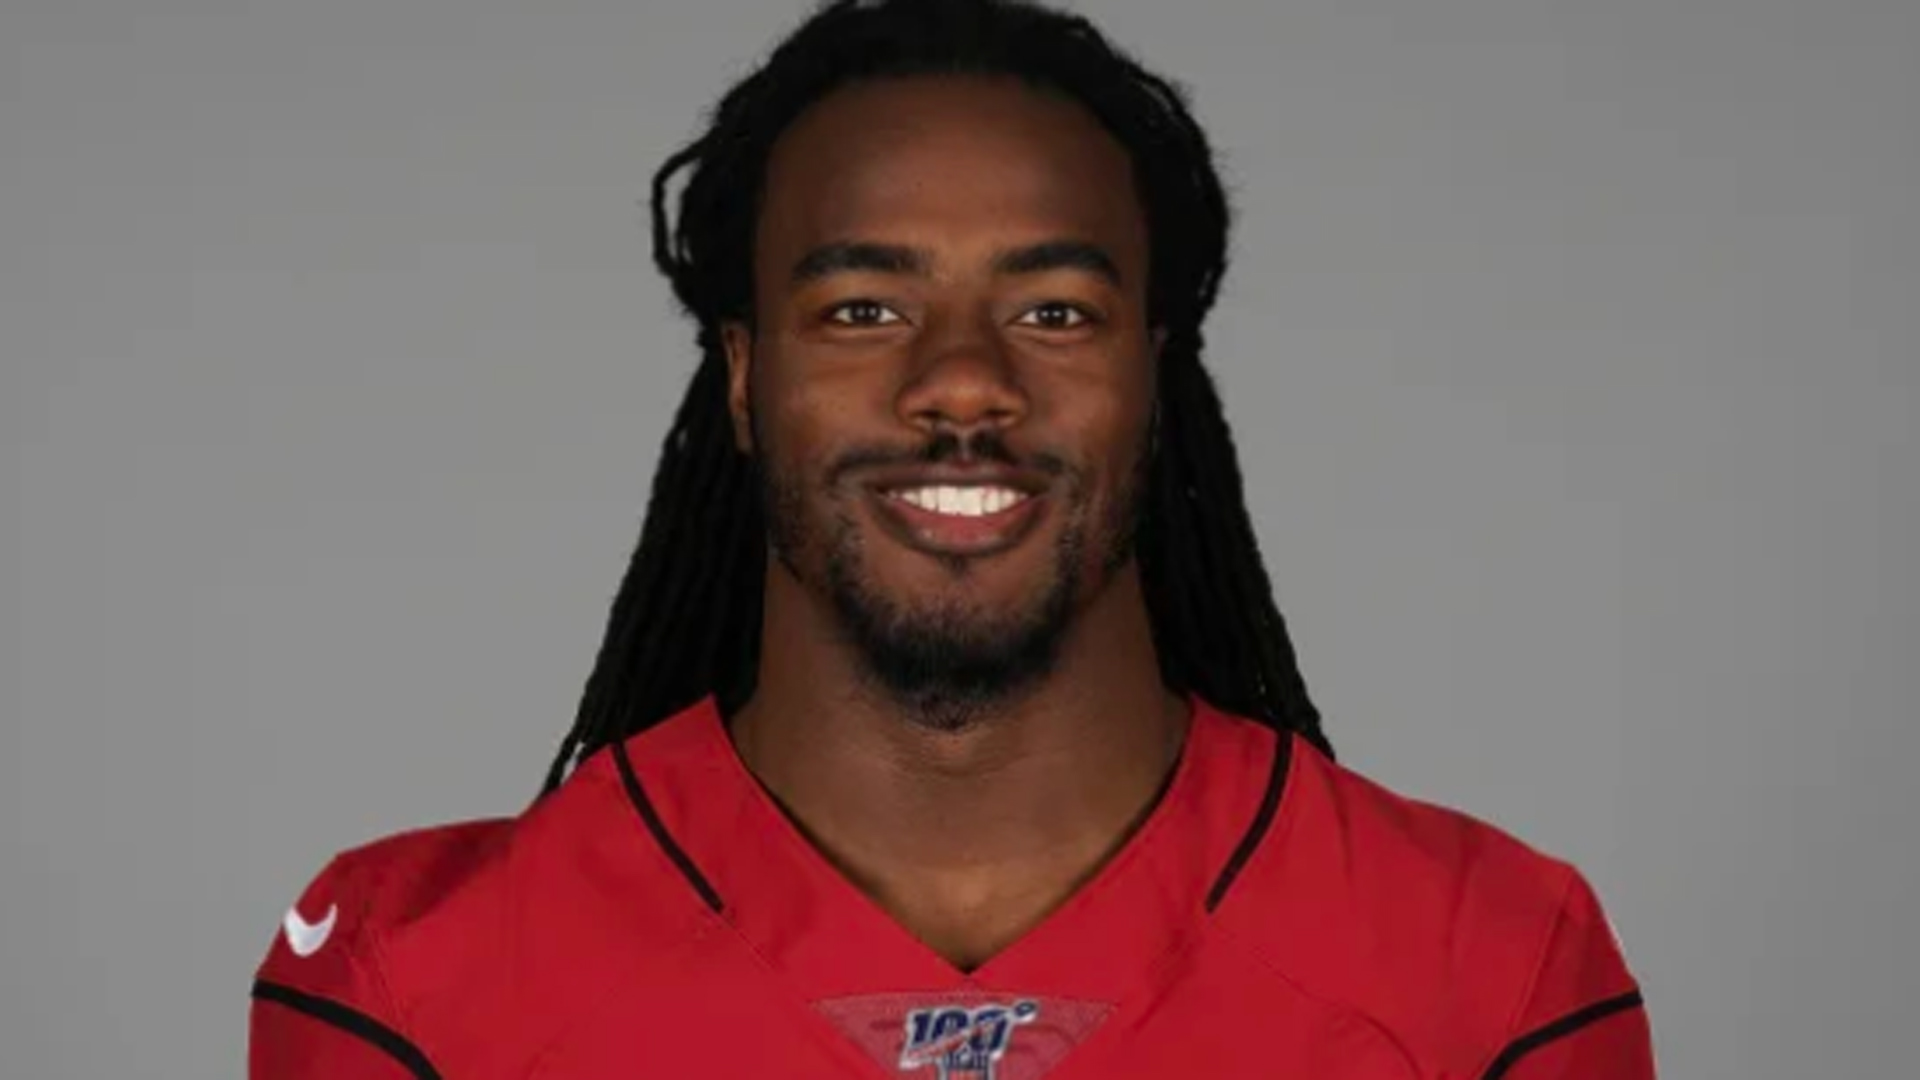 Josh Shaw is seen in an Arizona Cardinals team photo.